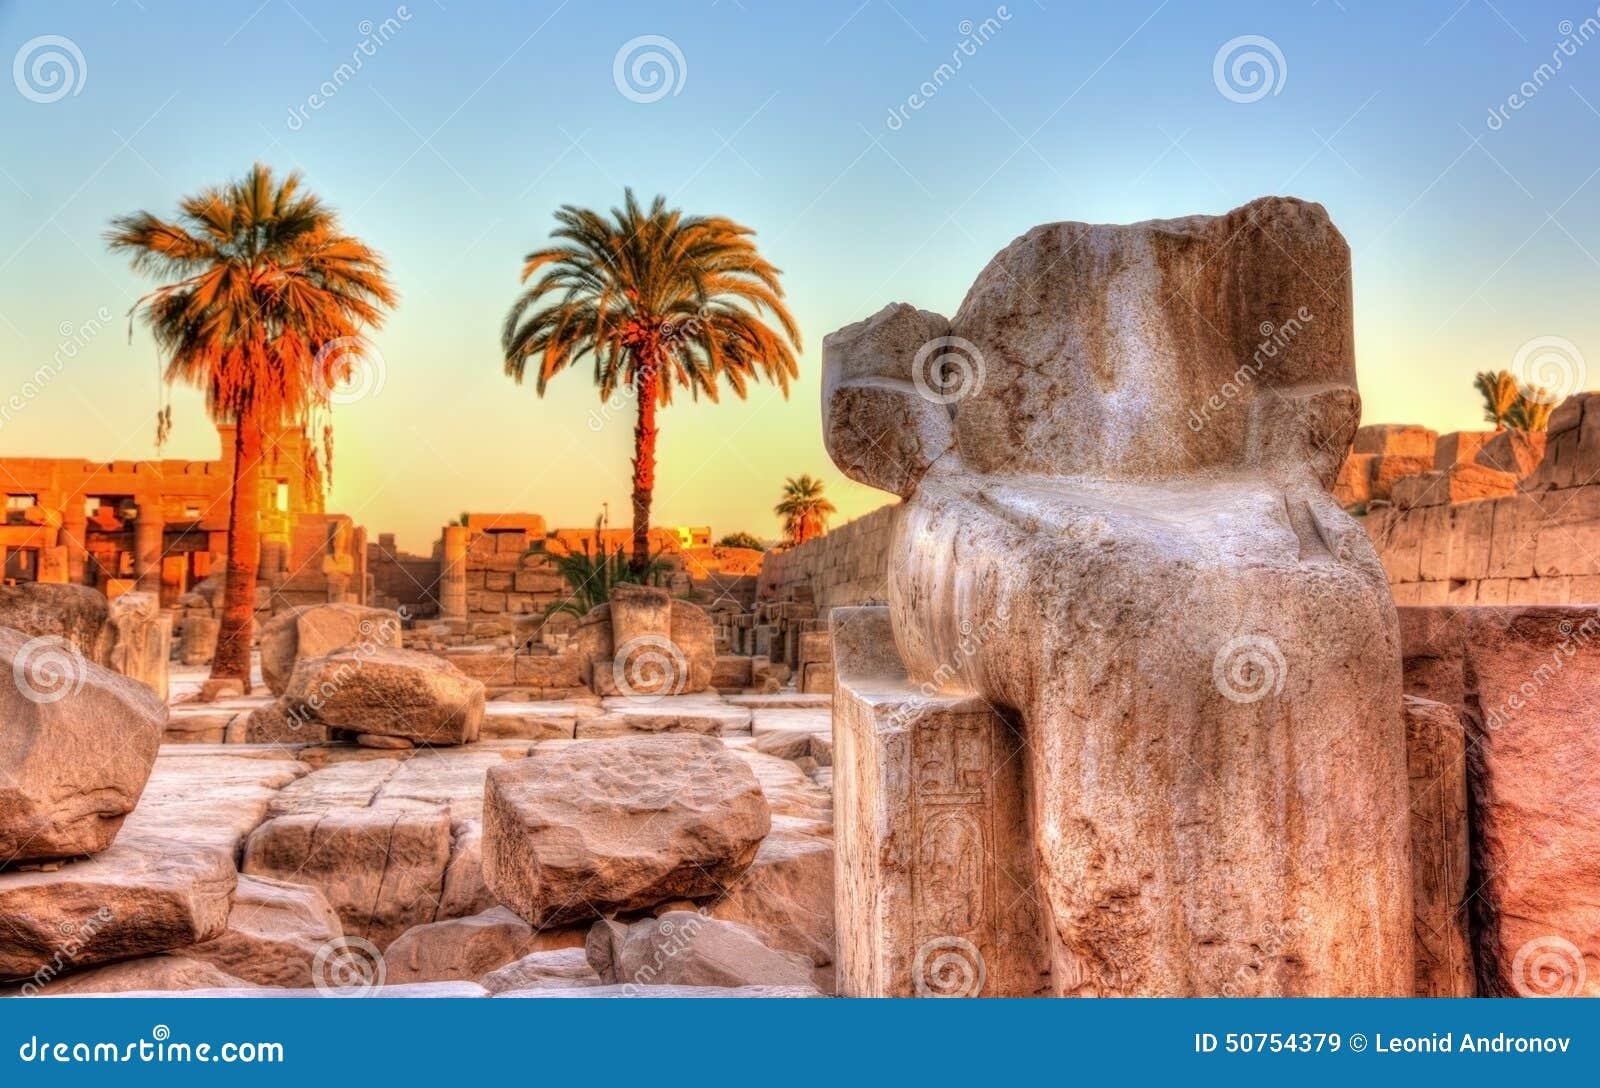 Broken ancient statue at the Karnak temple - Egypt